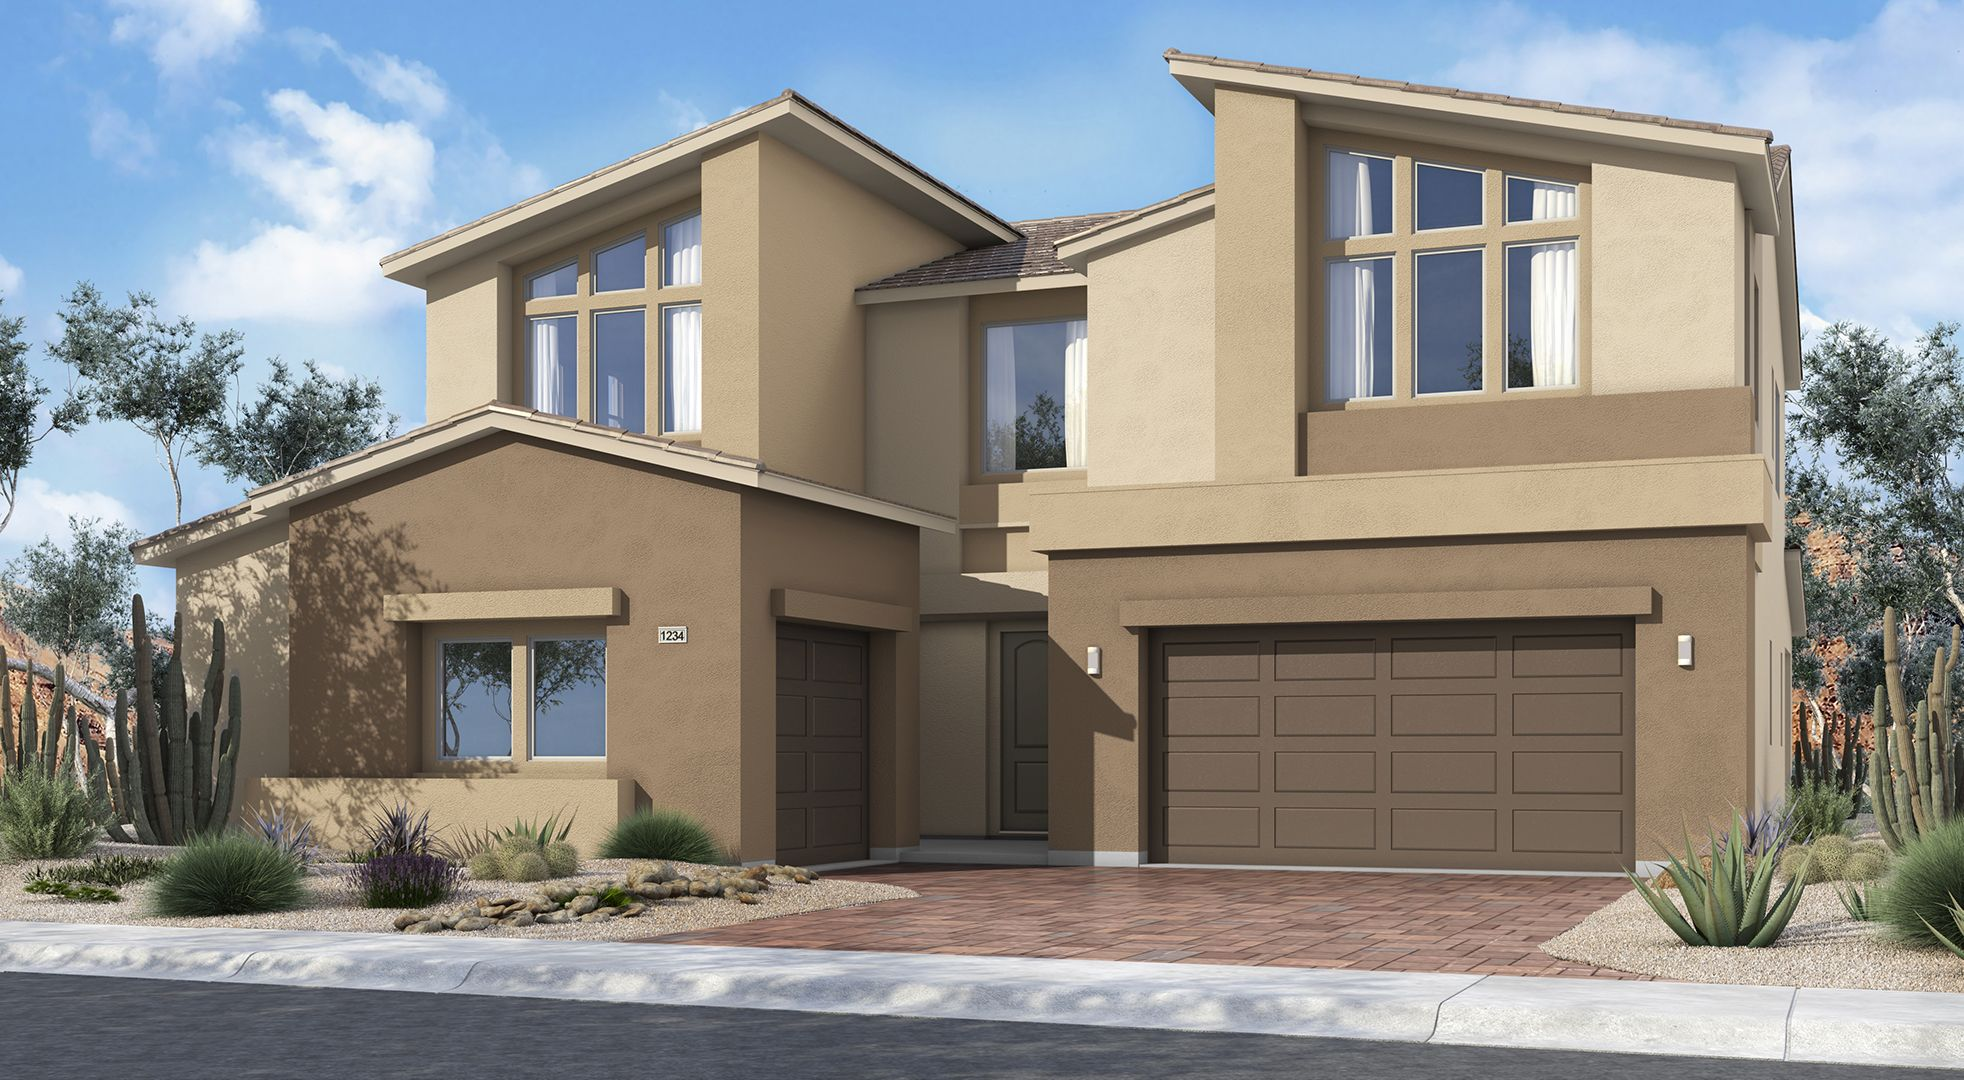 plan 2 plan henderson nevada 89011 plan 2 plan at the peaks by william lyon homes. Black Bedroom Furniture Sets. Home Design Ideas